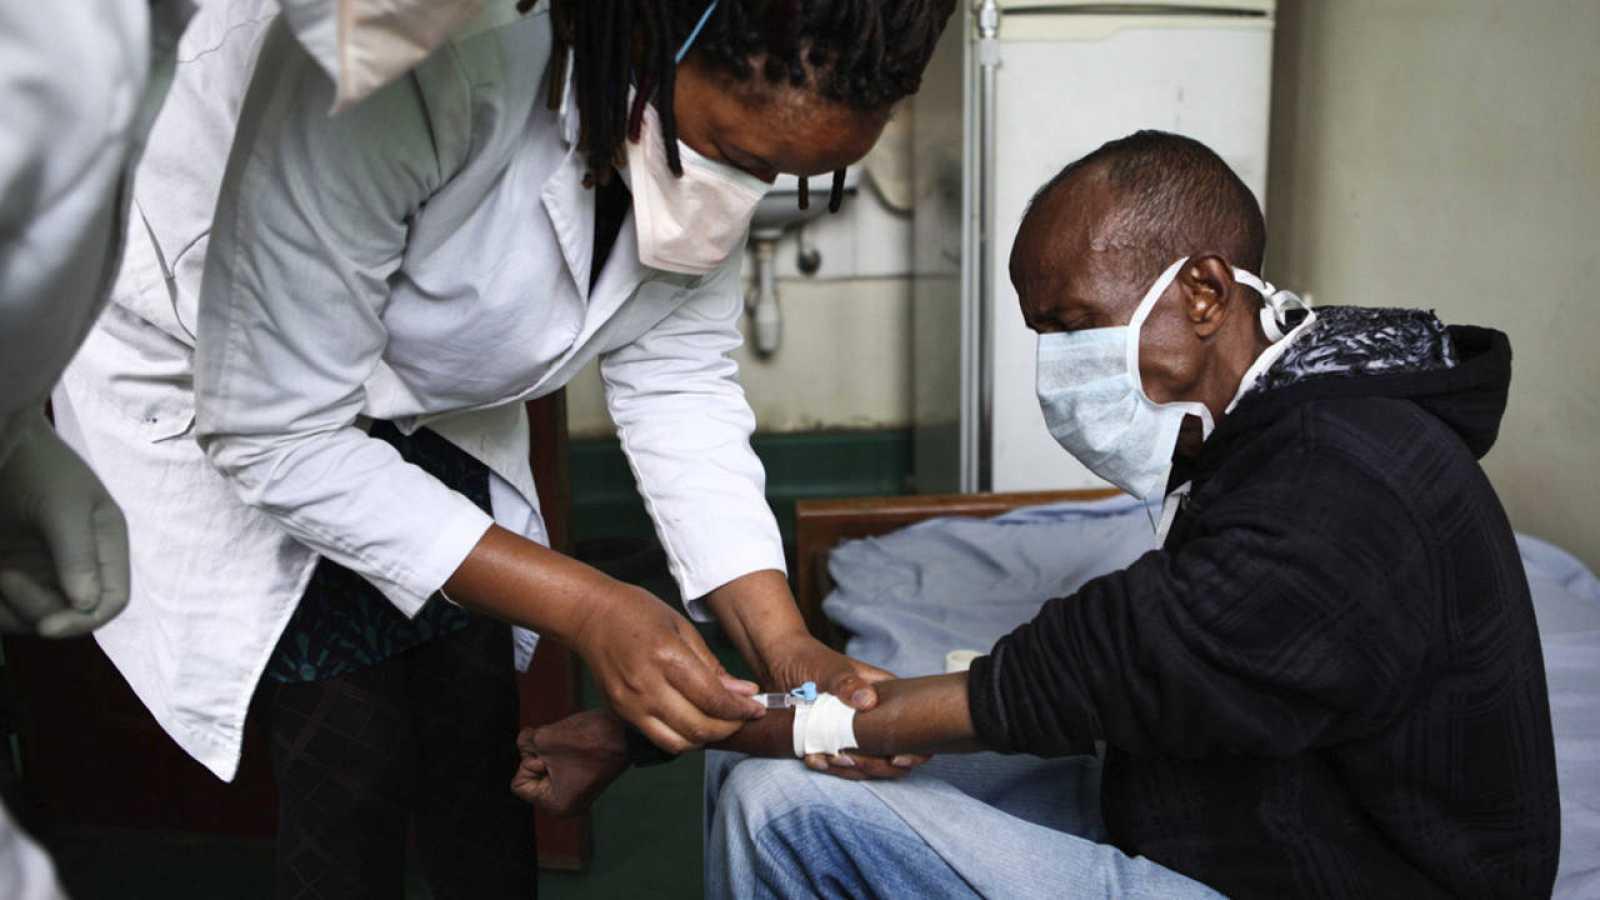 Solo en 2015, la tuberculosis mató a 1,8 millones de personas e infectó a 10,4 millones en el mundo.